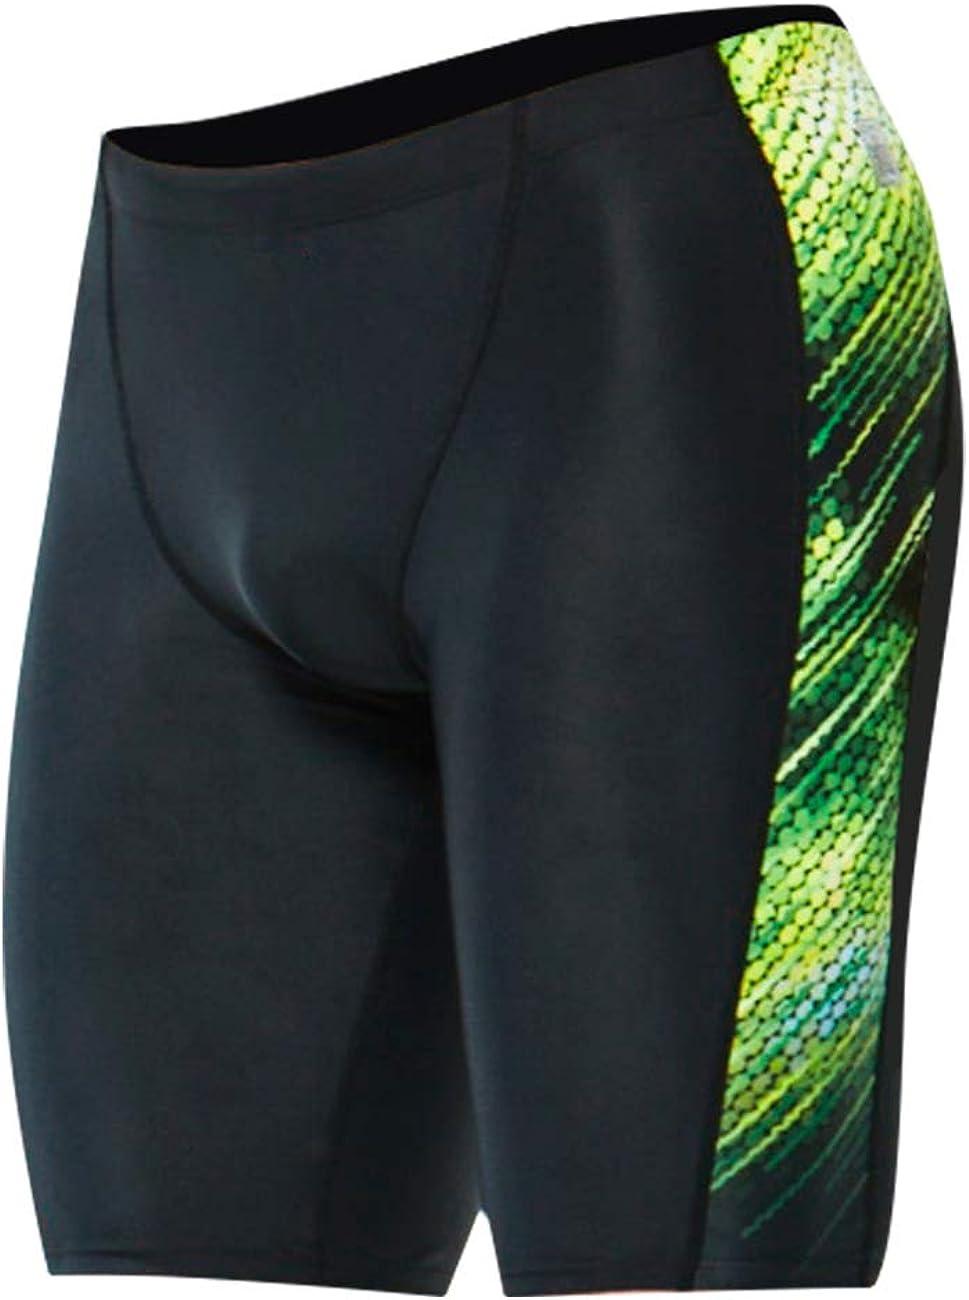 Karrack Jammer Swimsuit Mens Solid Swim Jammers Endurance Long Racing Training Swimsuit